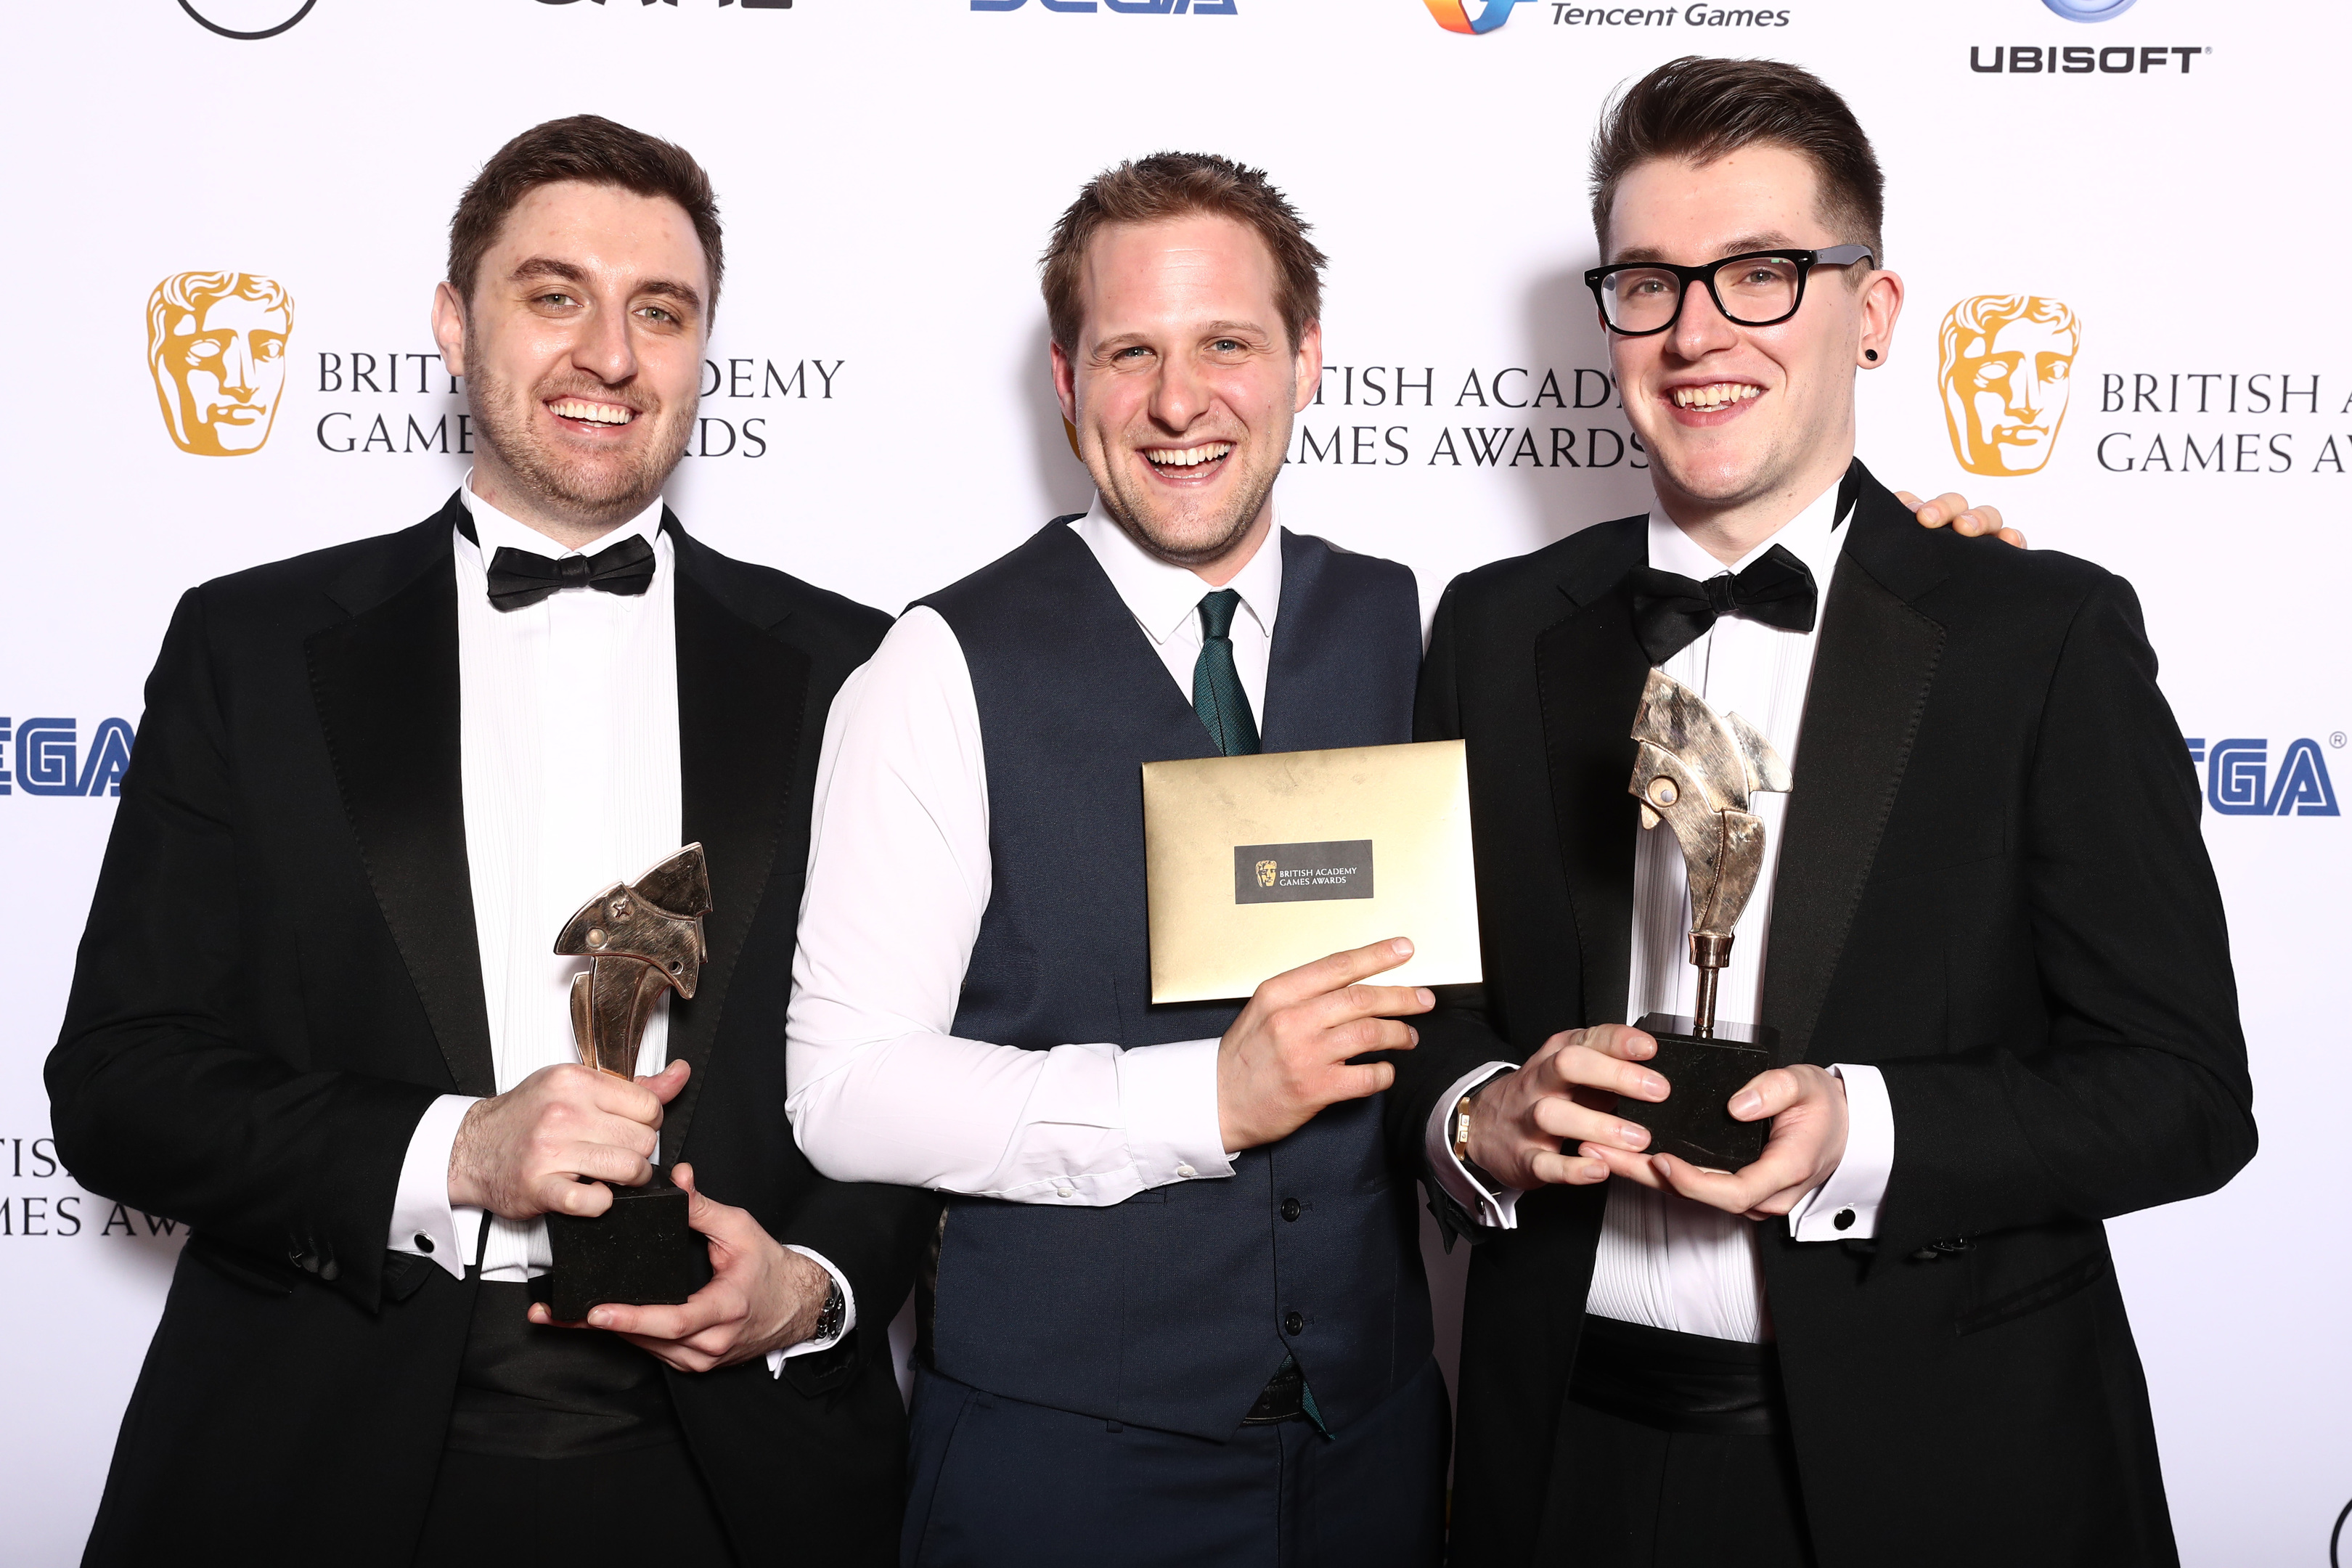 The Bluedoor Games team (L-R) Lukasz Gomula, Ashton Mills and Roberto Macken, celebrate their BAFTA win.